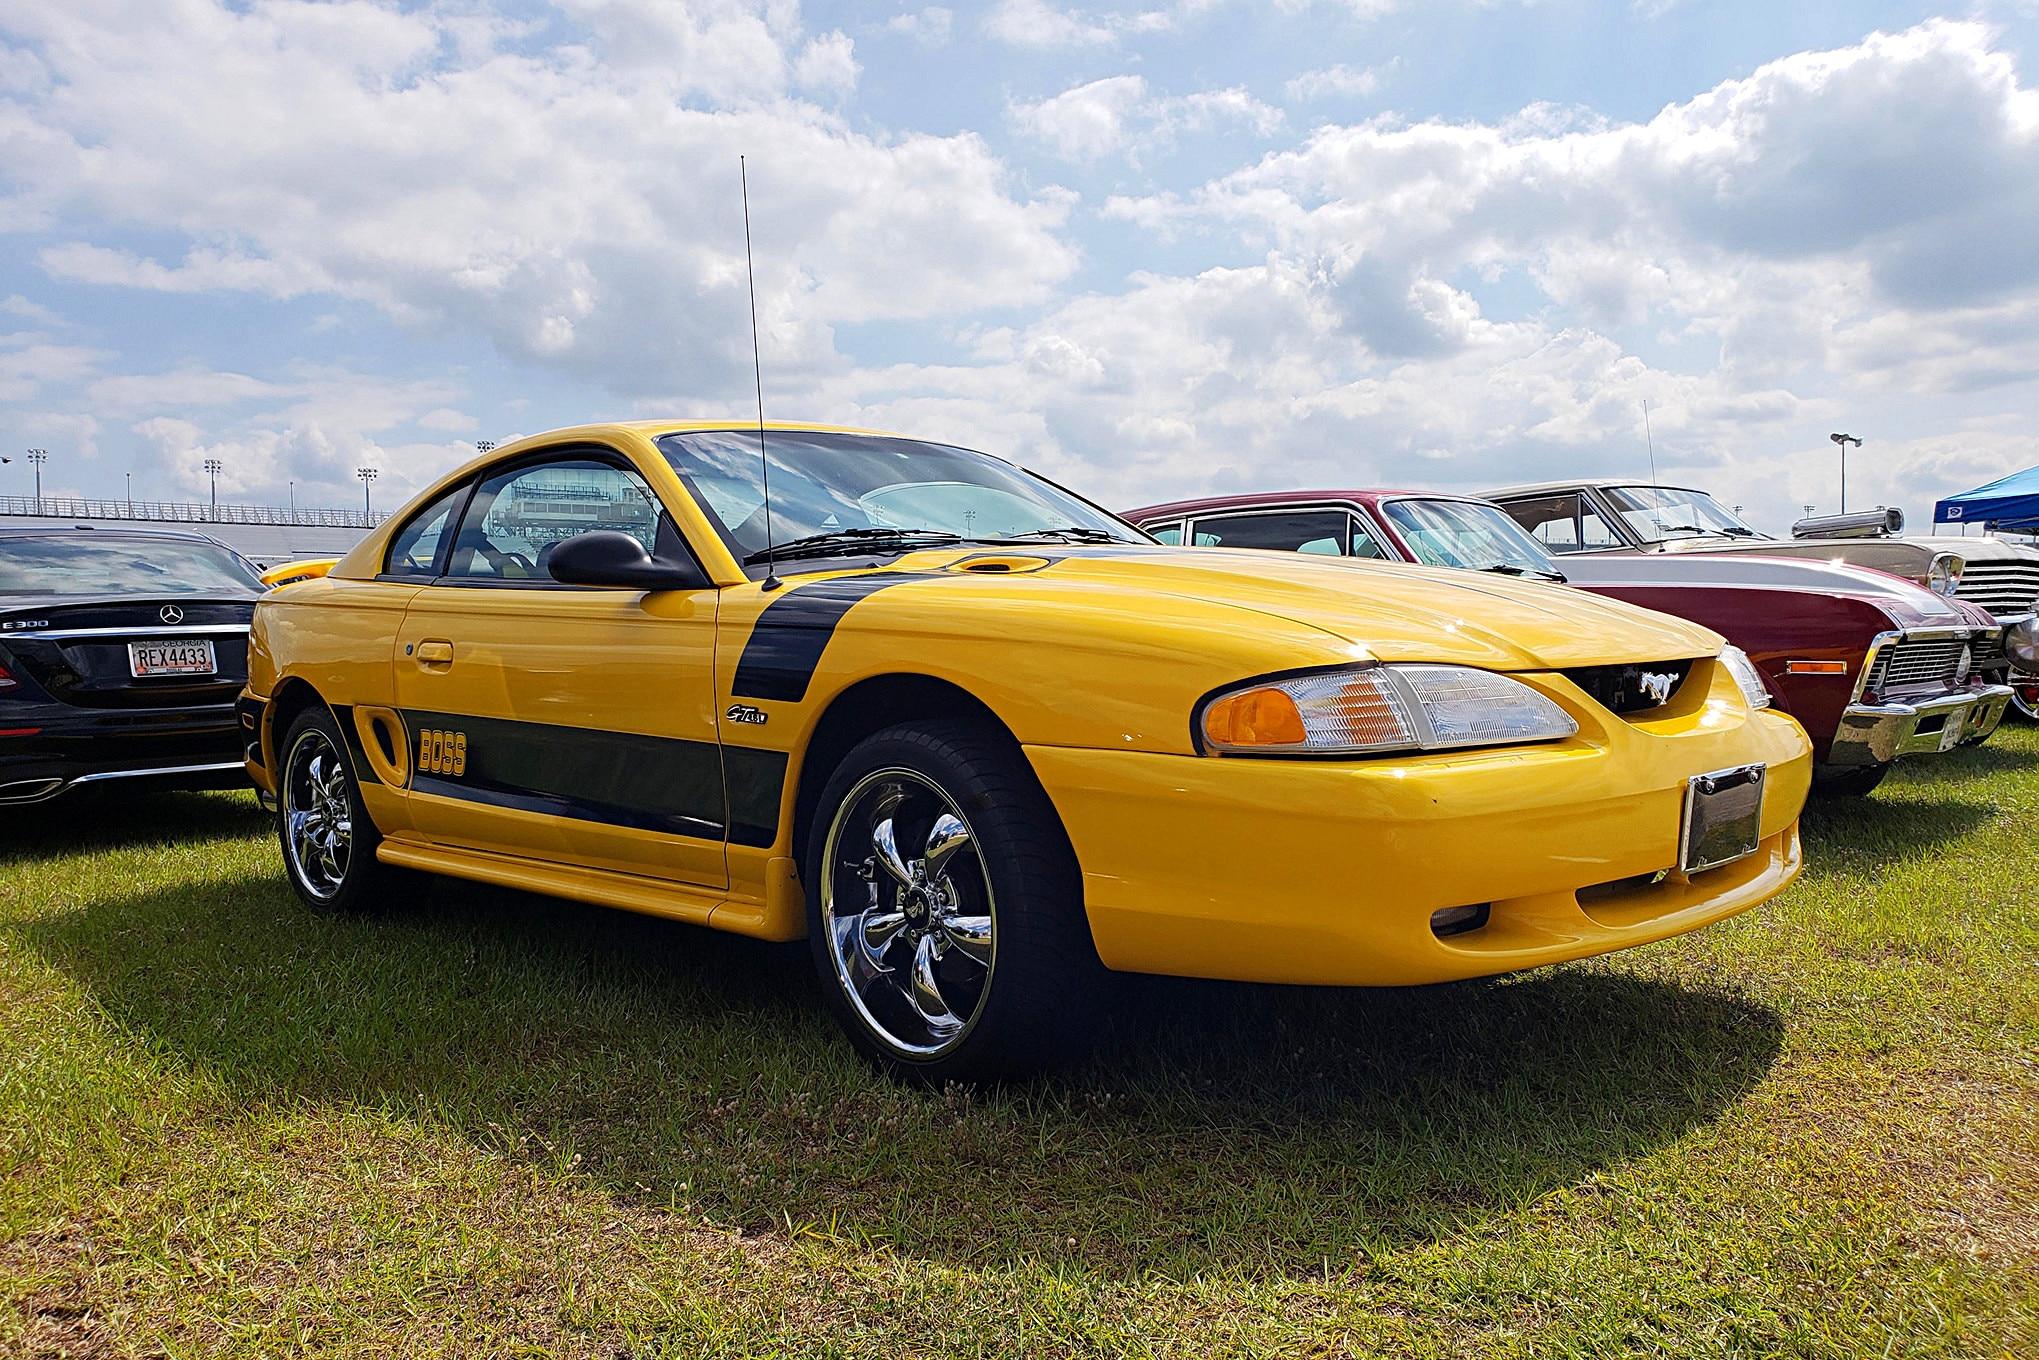 2018 Hot Rod Power Tour Mustangs 067